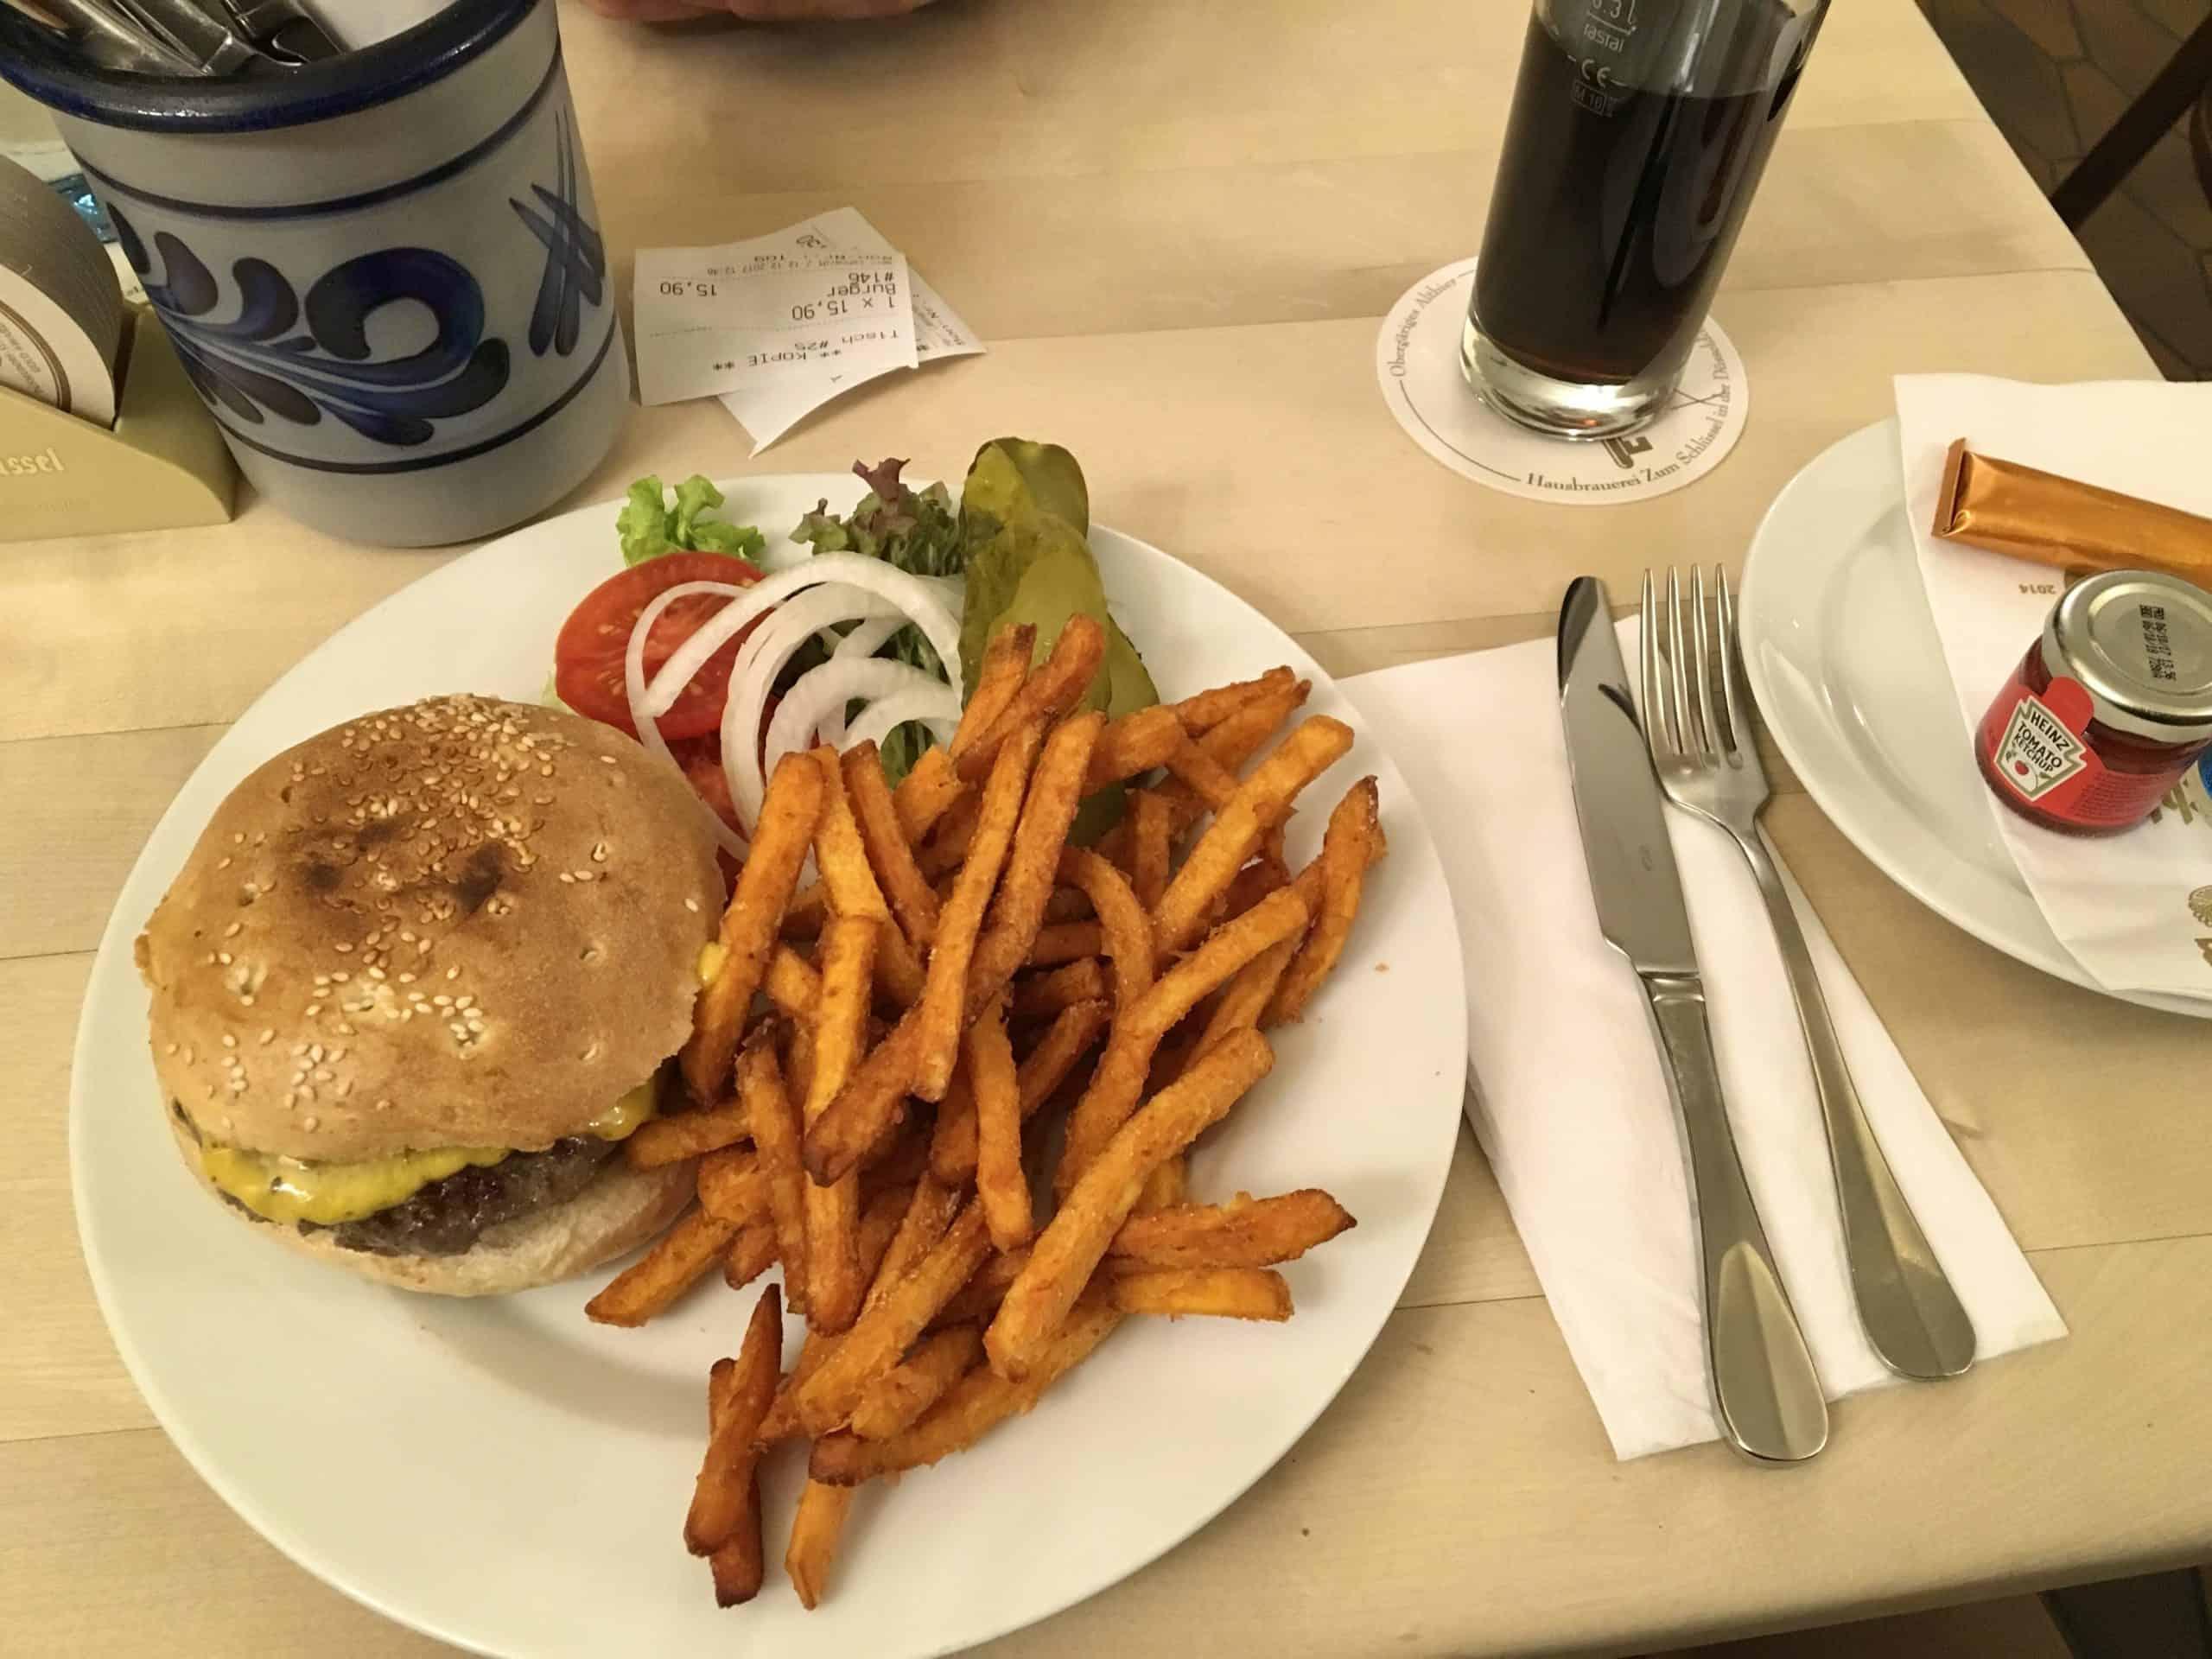 Gastronomie mieten in Düsseldorf